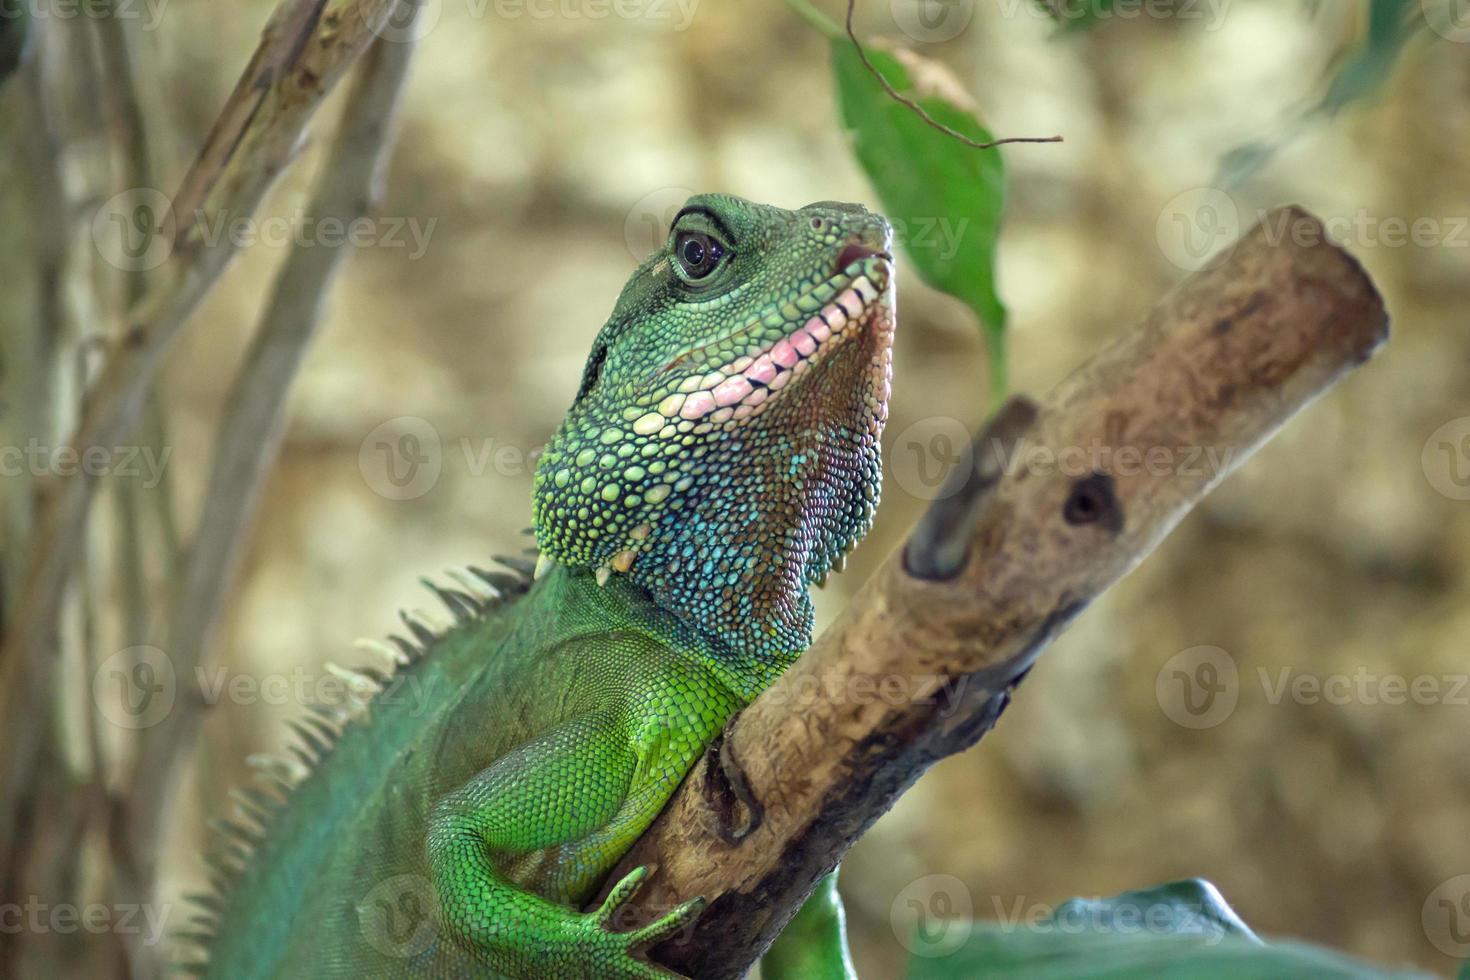 Lizard Portrait photo